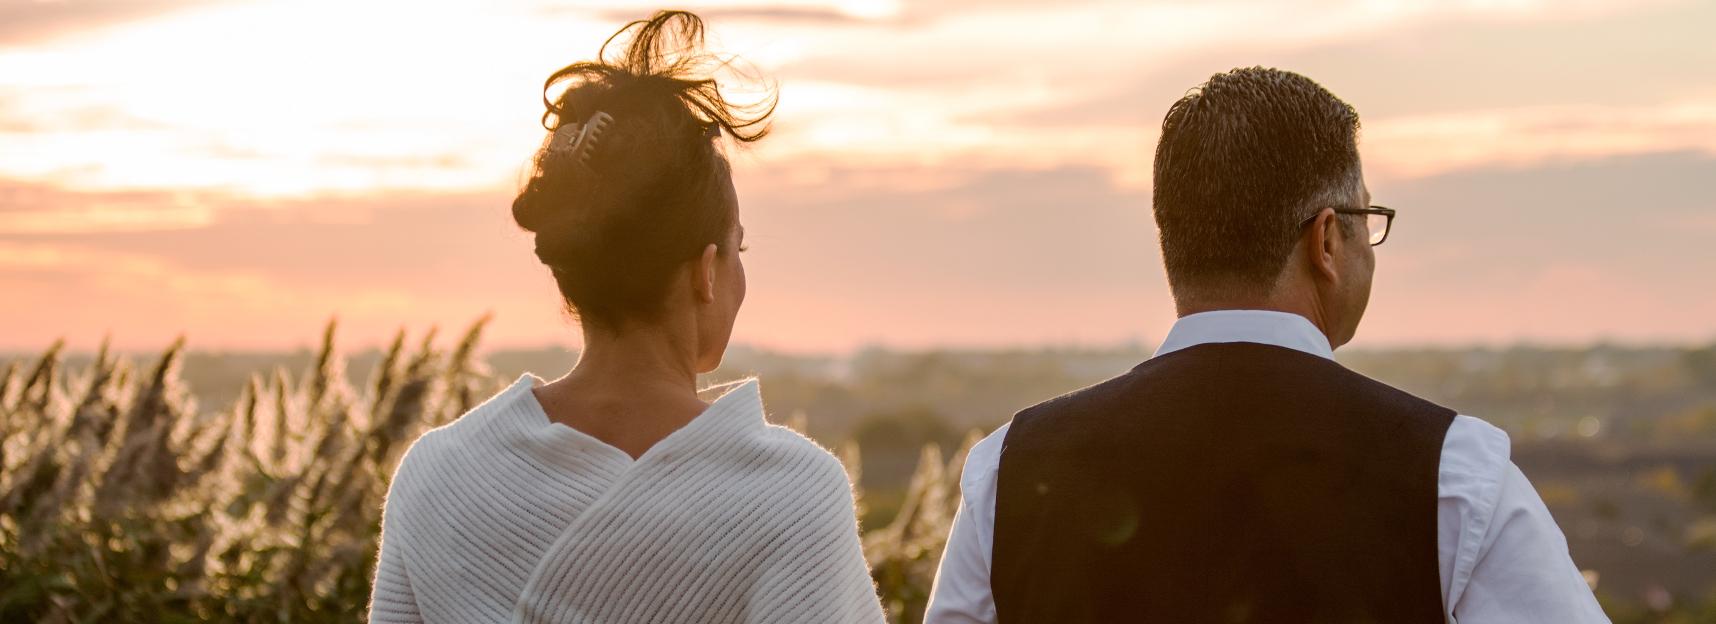 Couple-USDA-Rural-Living-Online-Mortgage-Home-Loan